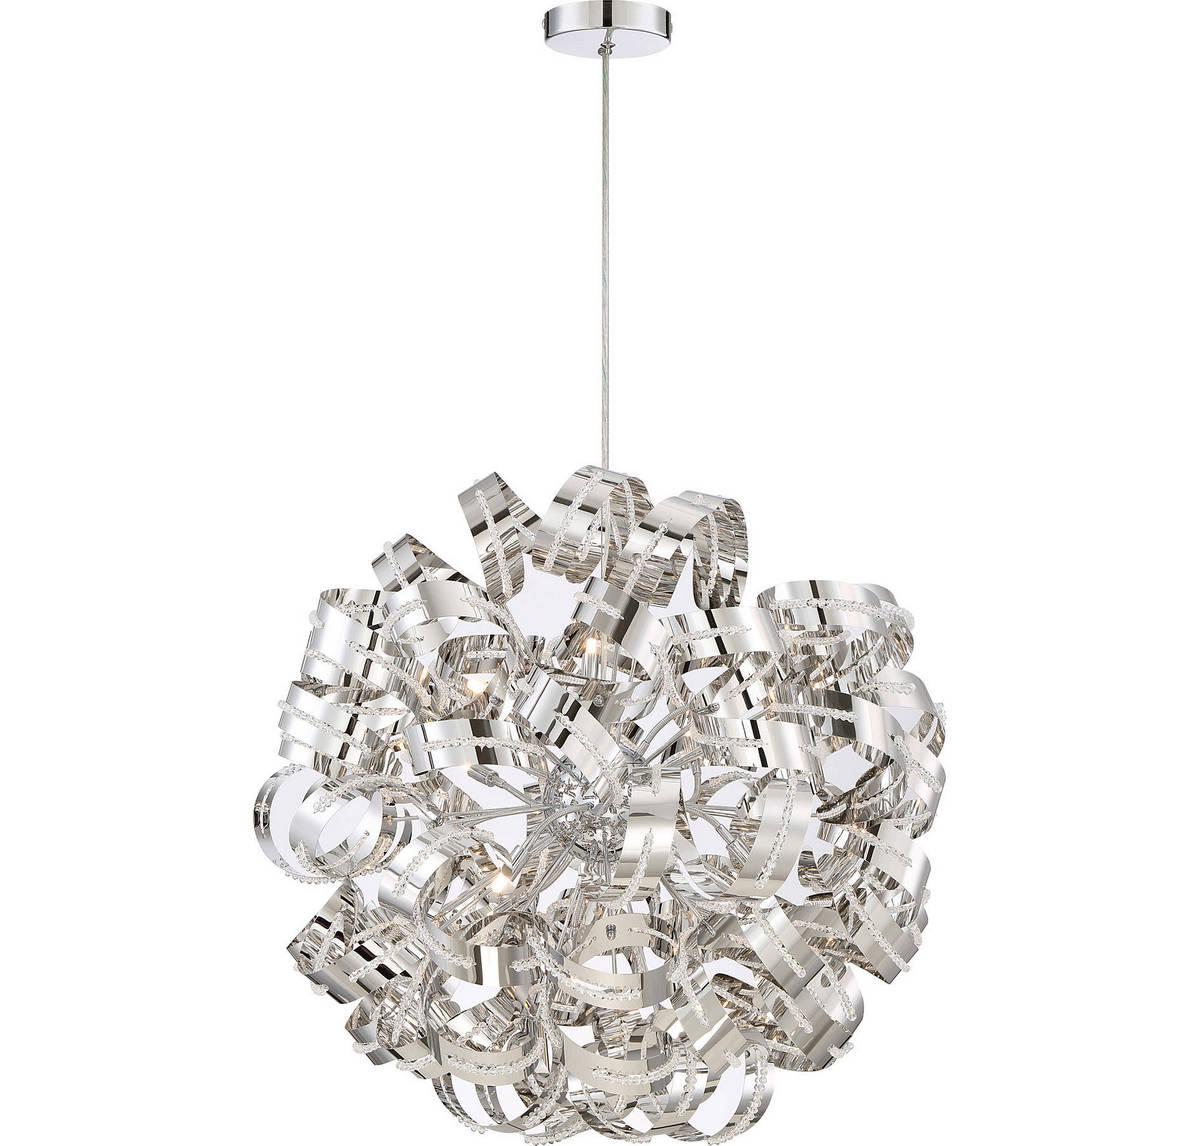 Quoizel Ribbons 31 12-Light Chandelier in Crystal Chrome